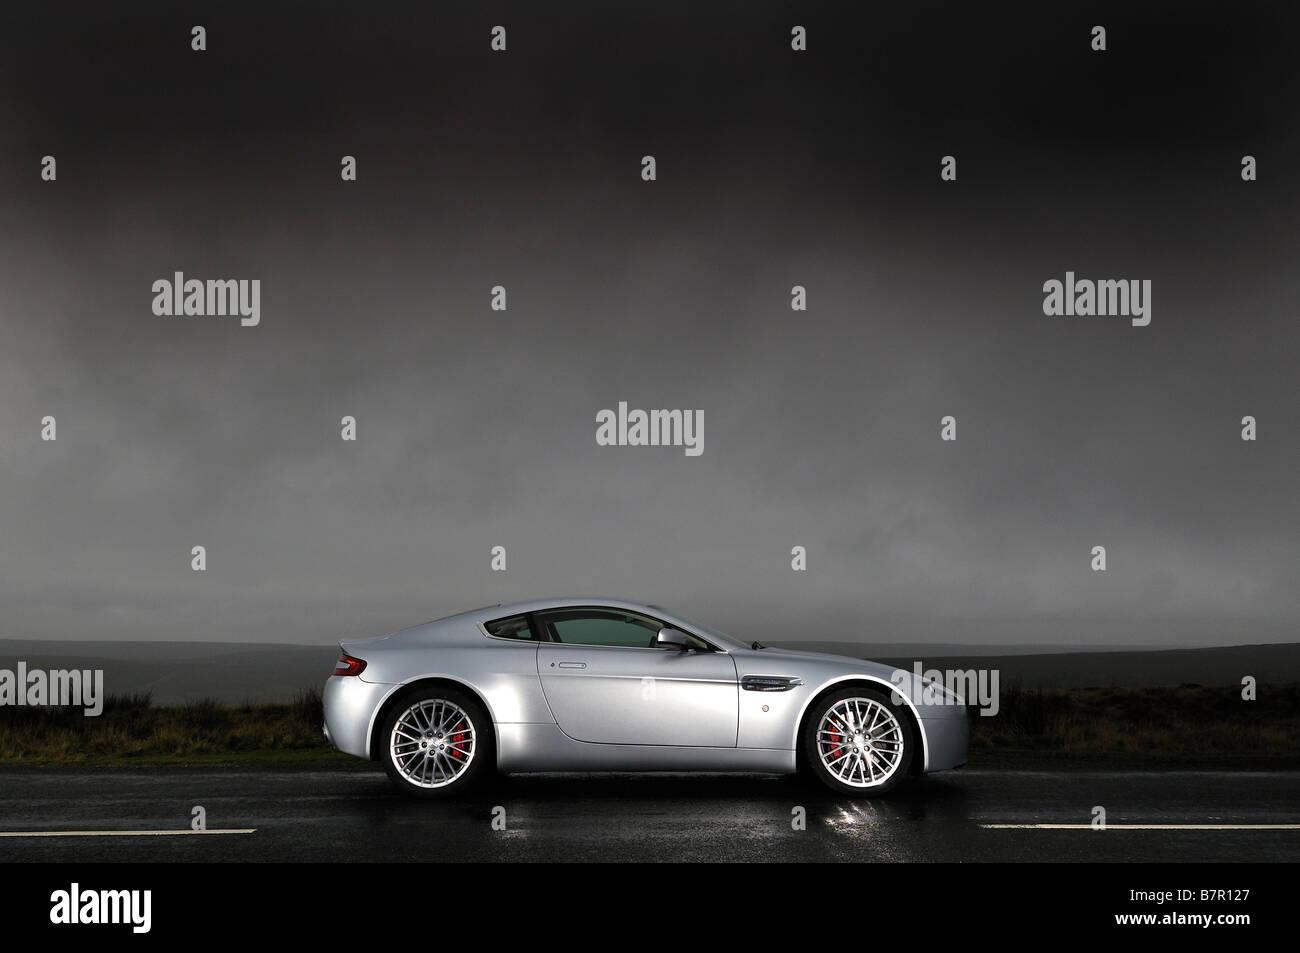 Aston Martin V8 Vantage Stockbild